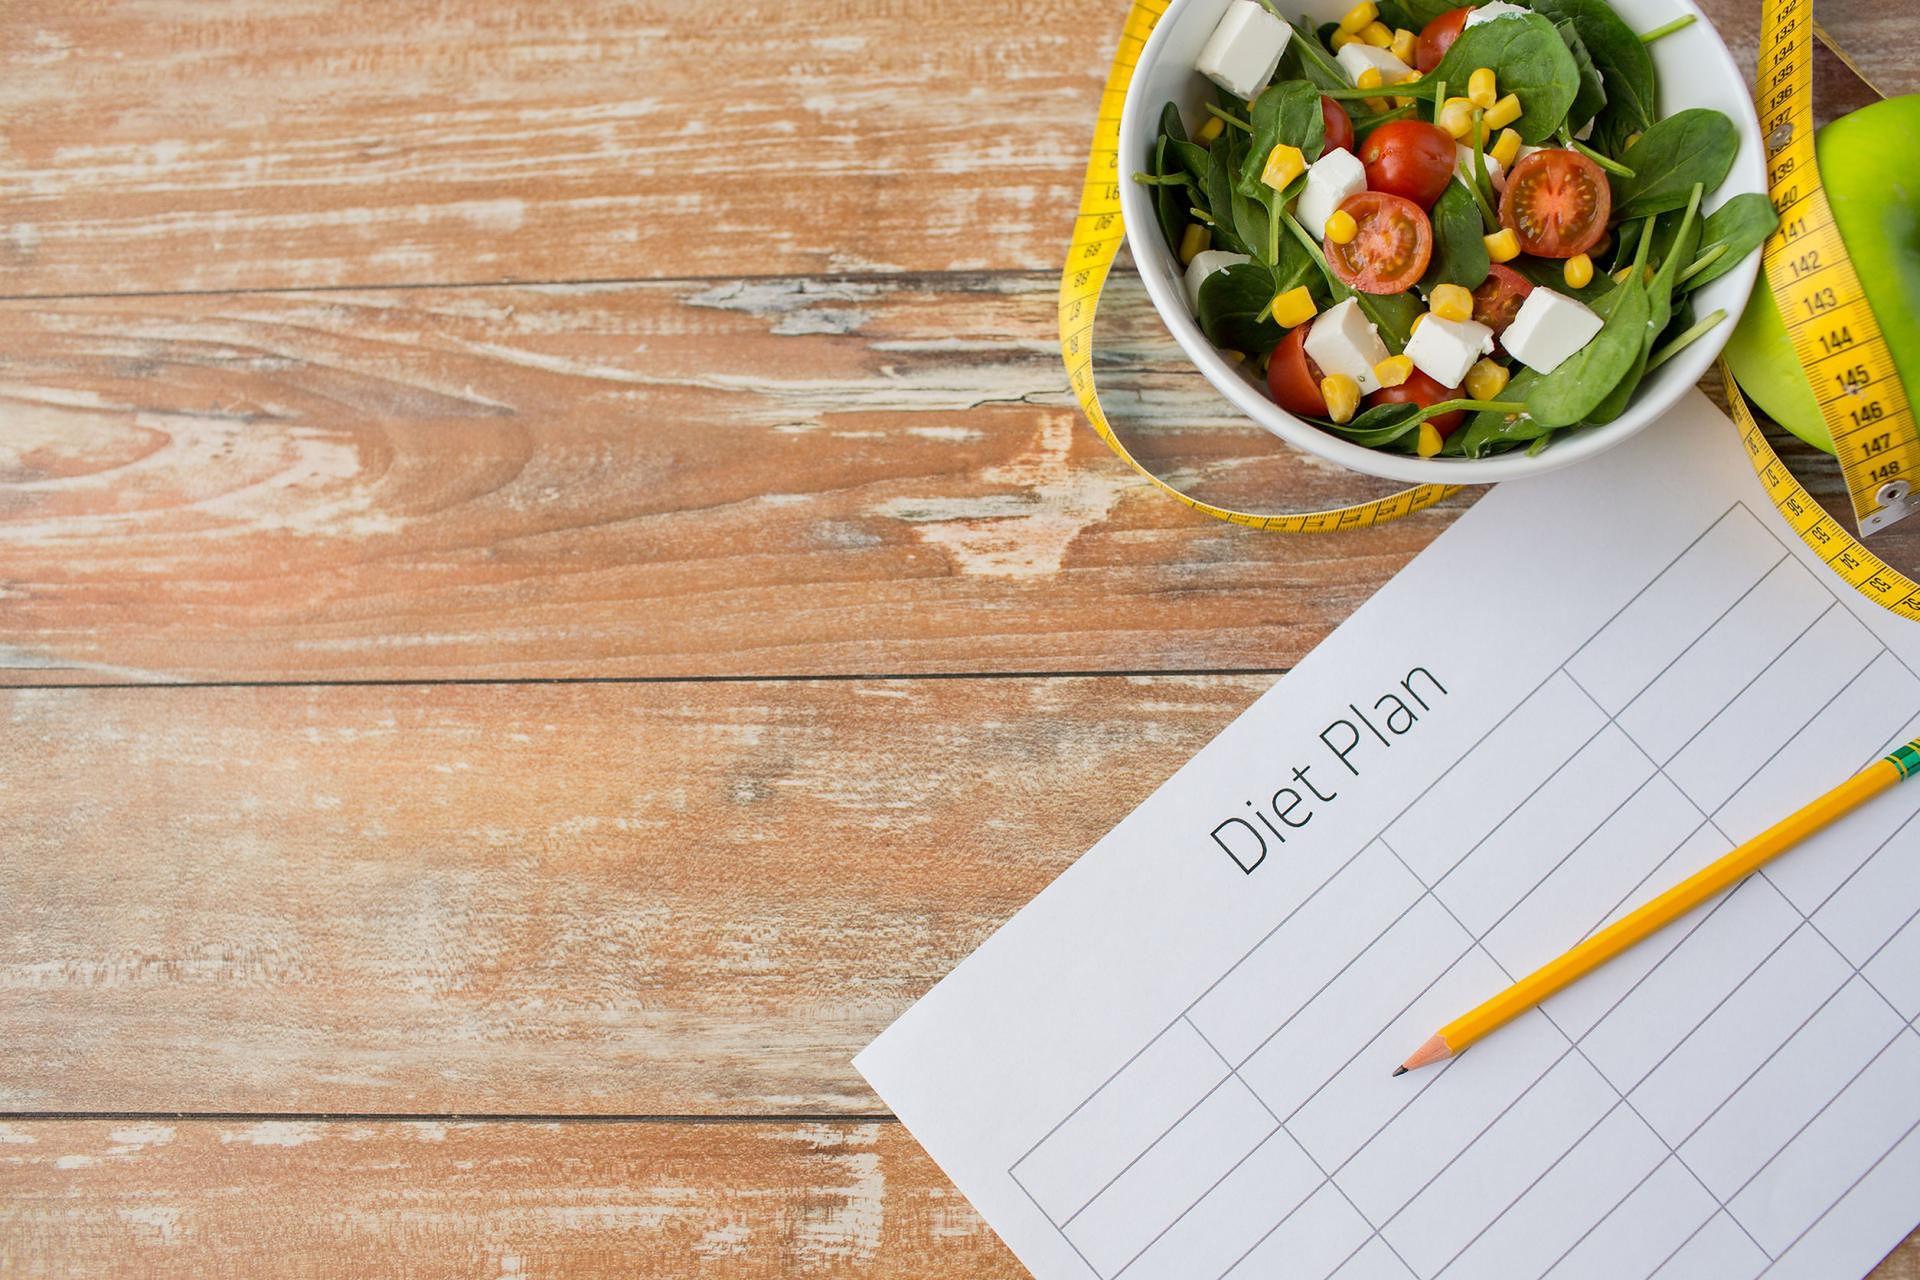 dieta endocrinologica a 1400 calorie